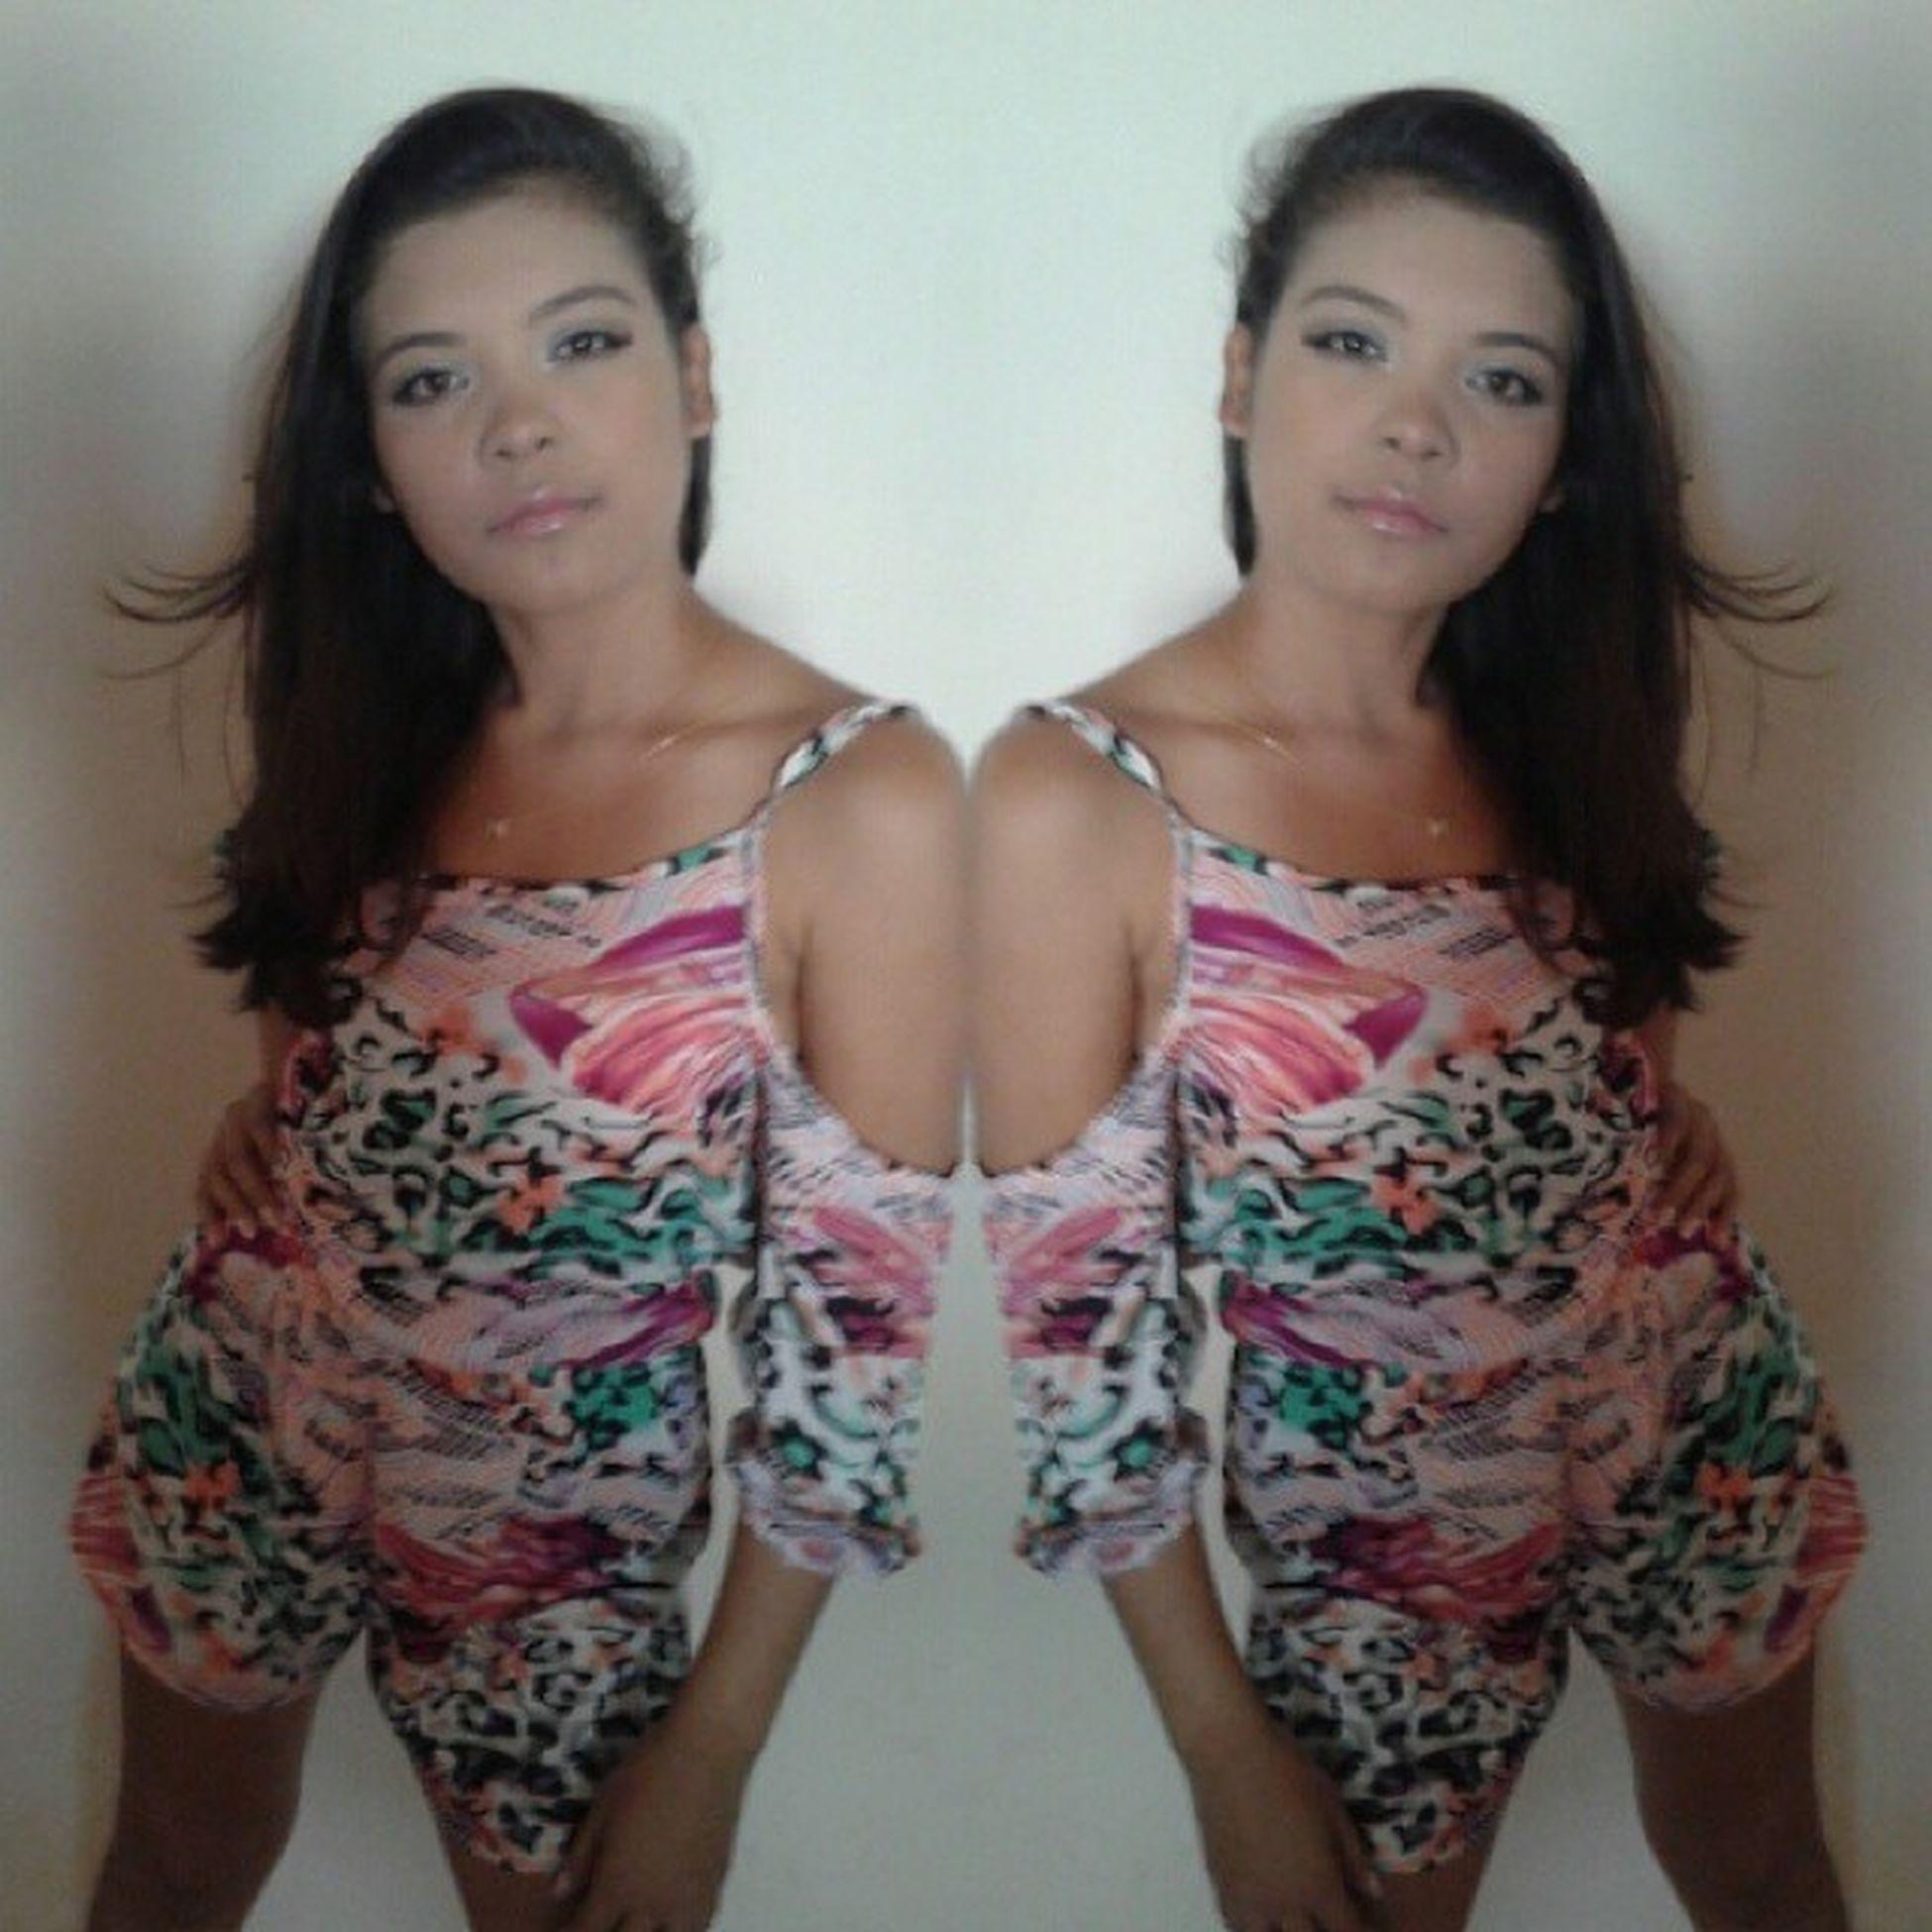 MacaquinhoPerfeito EscolhaPerfeita Super_Na_Moda Vem_Pra_ @annelaboutique Make by @_annaa1510